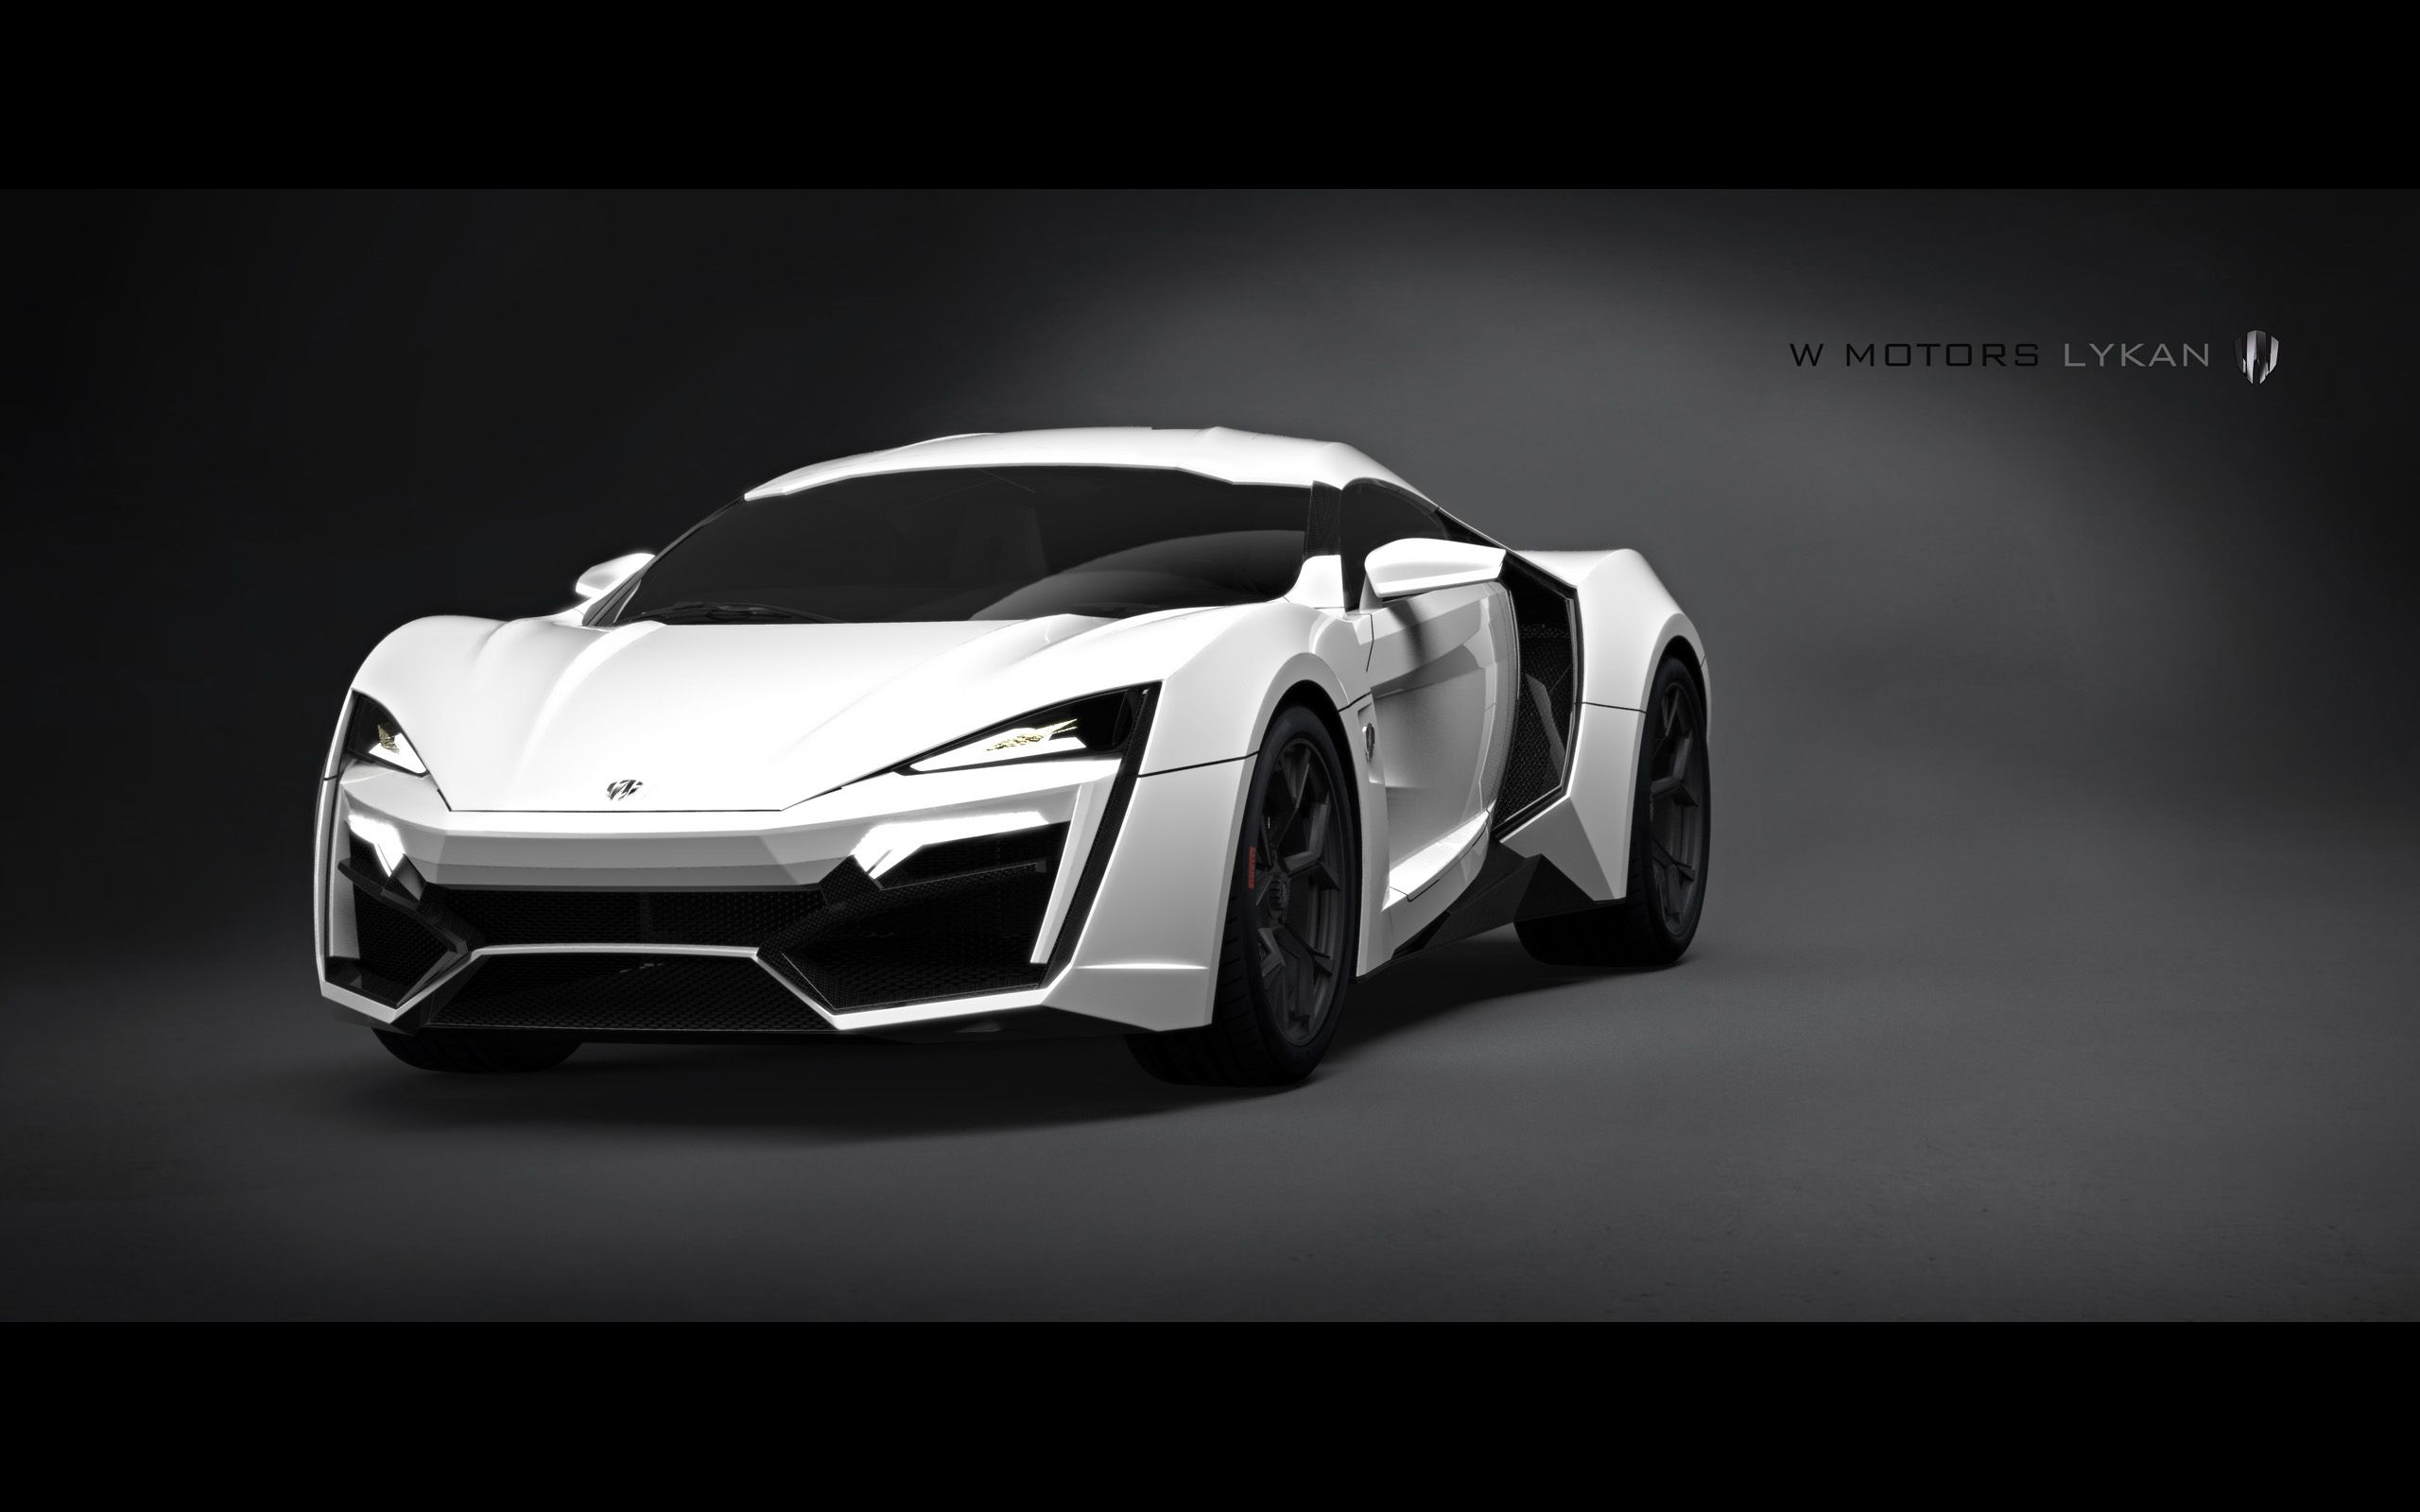 Lykan Hypersport Hd Wallpapers Free Download Lykan Hypersport Hd Lykan Hypersport Expensive Sports Cars Most Expensive Sports Car